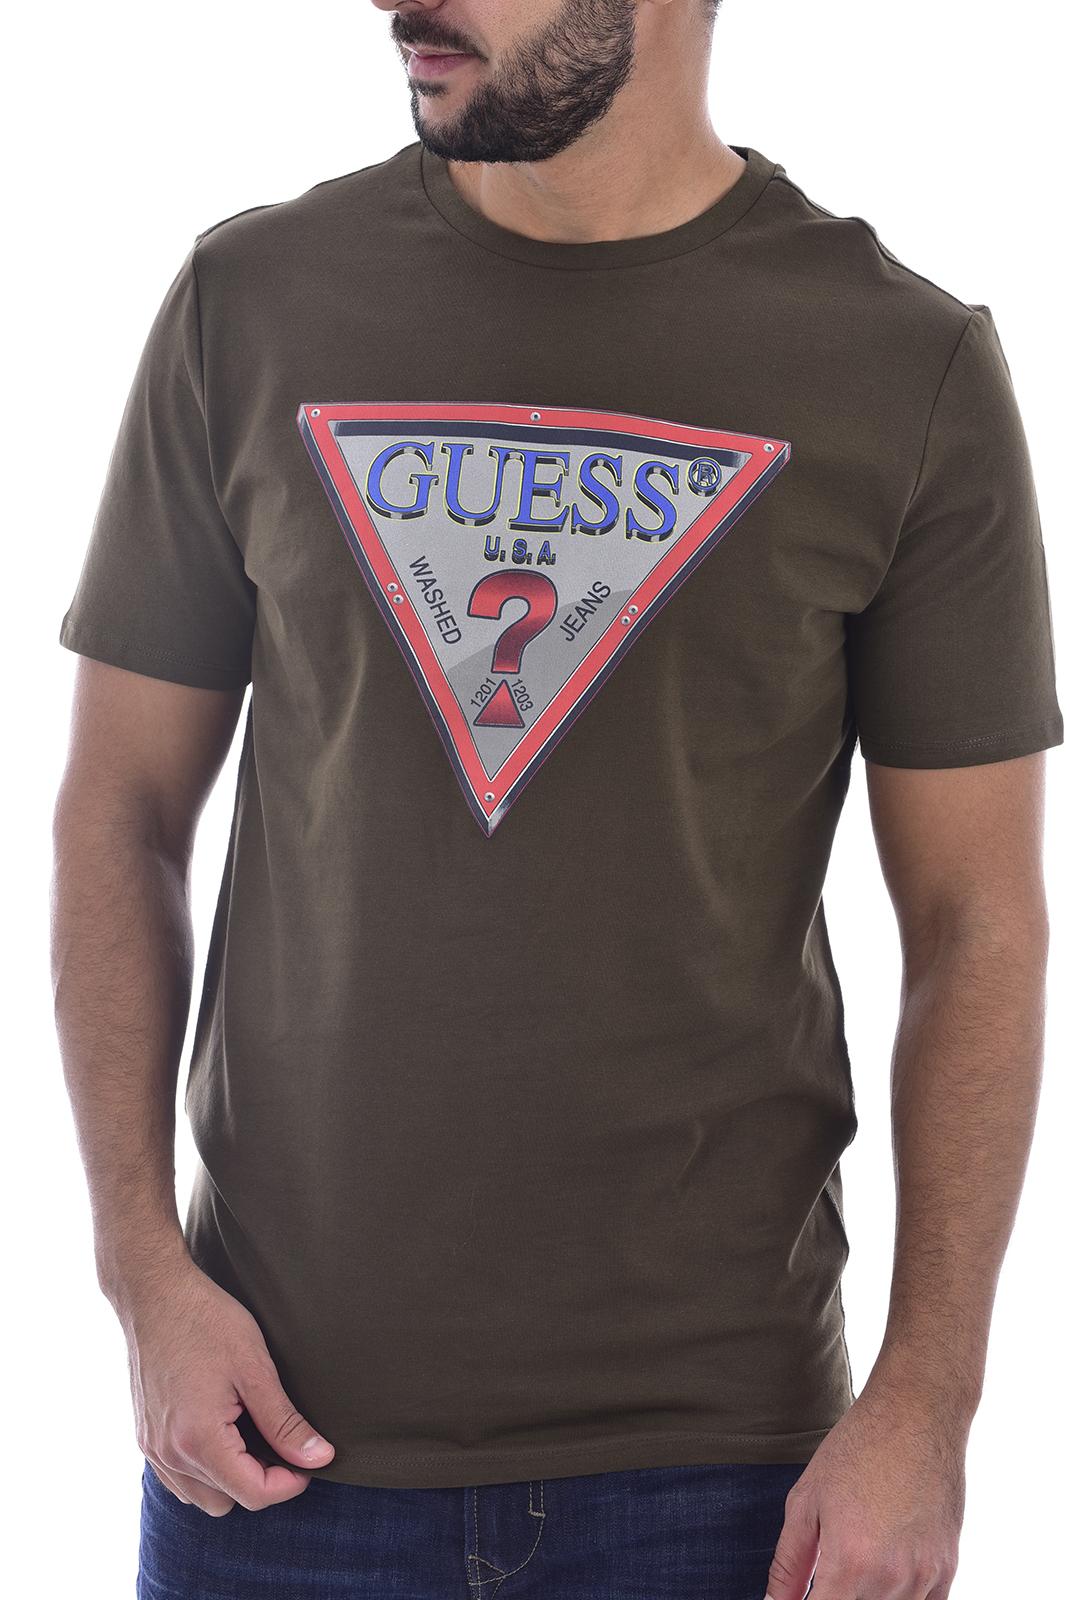 T-S manches courtes  Guess jeans M0BI58 J1300 G1M kaki